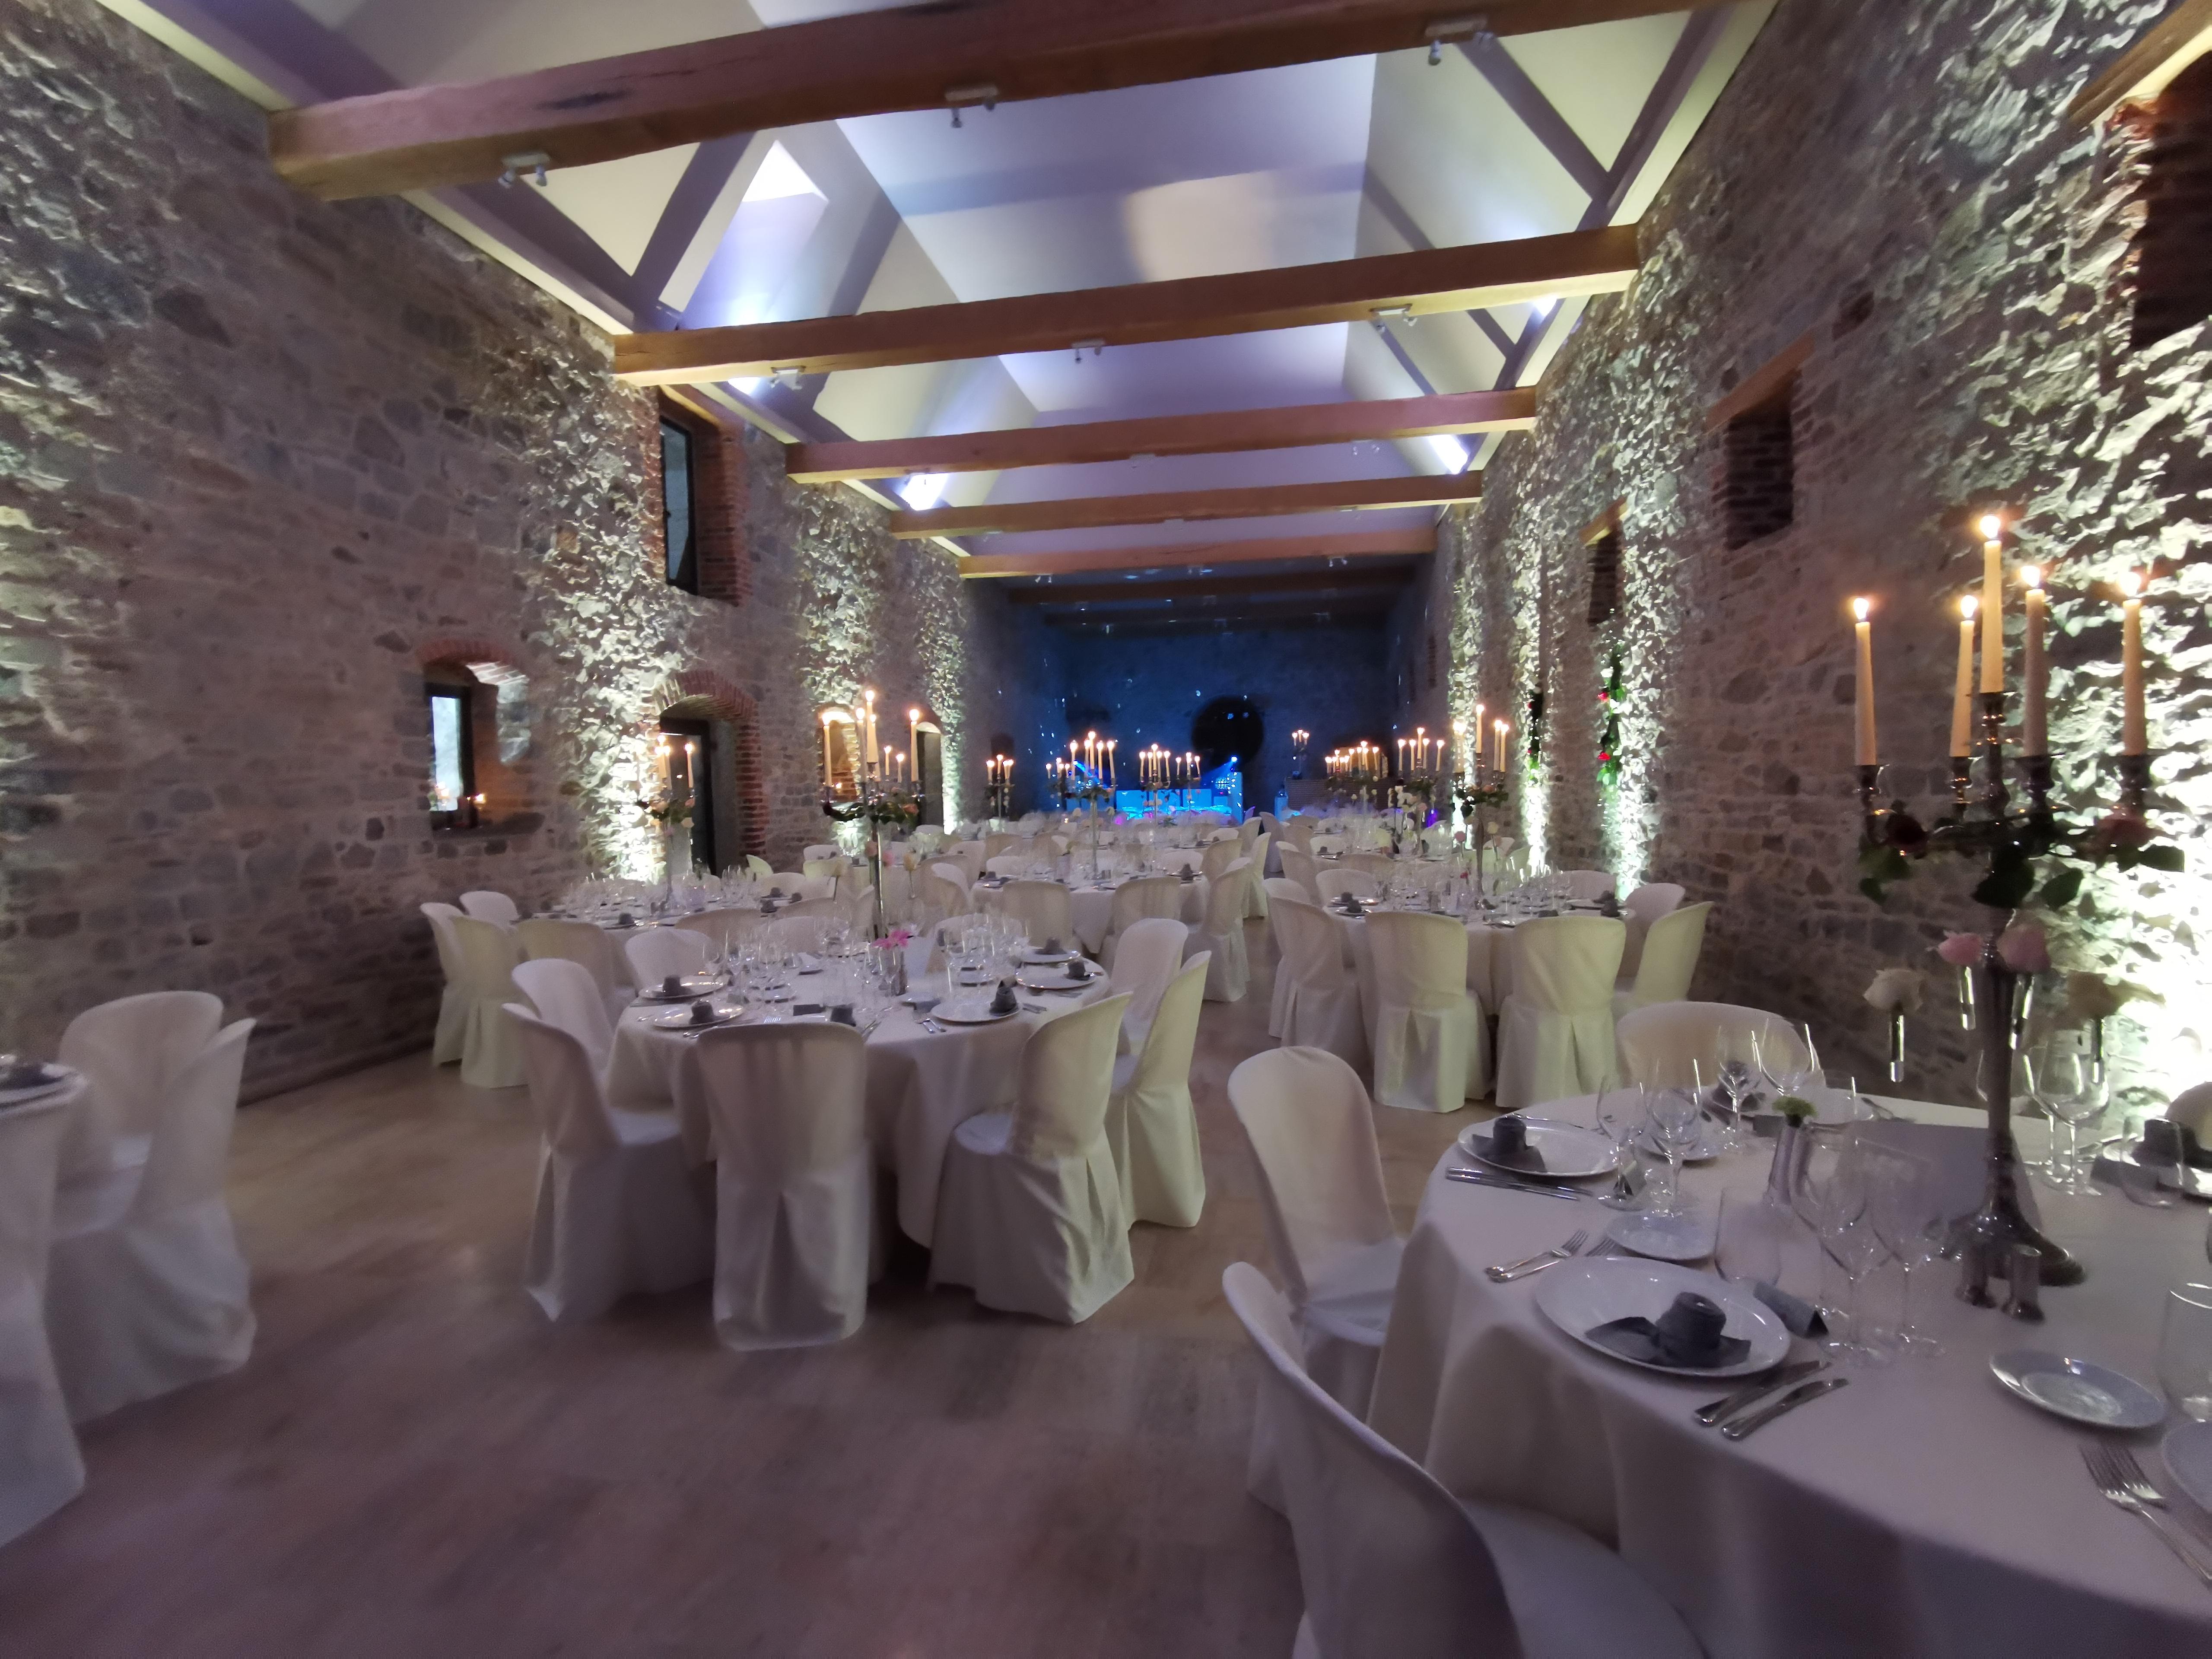 Salle de Banquet Rouveroy